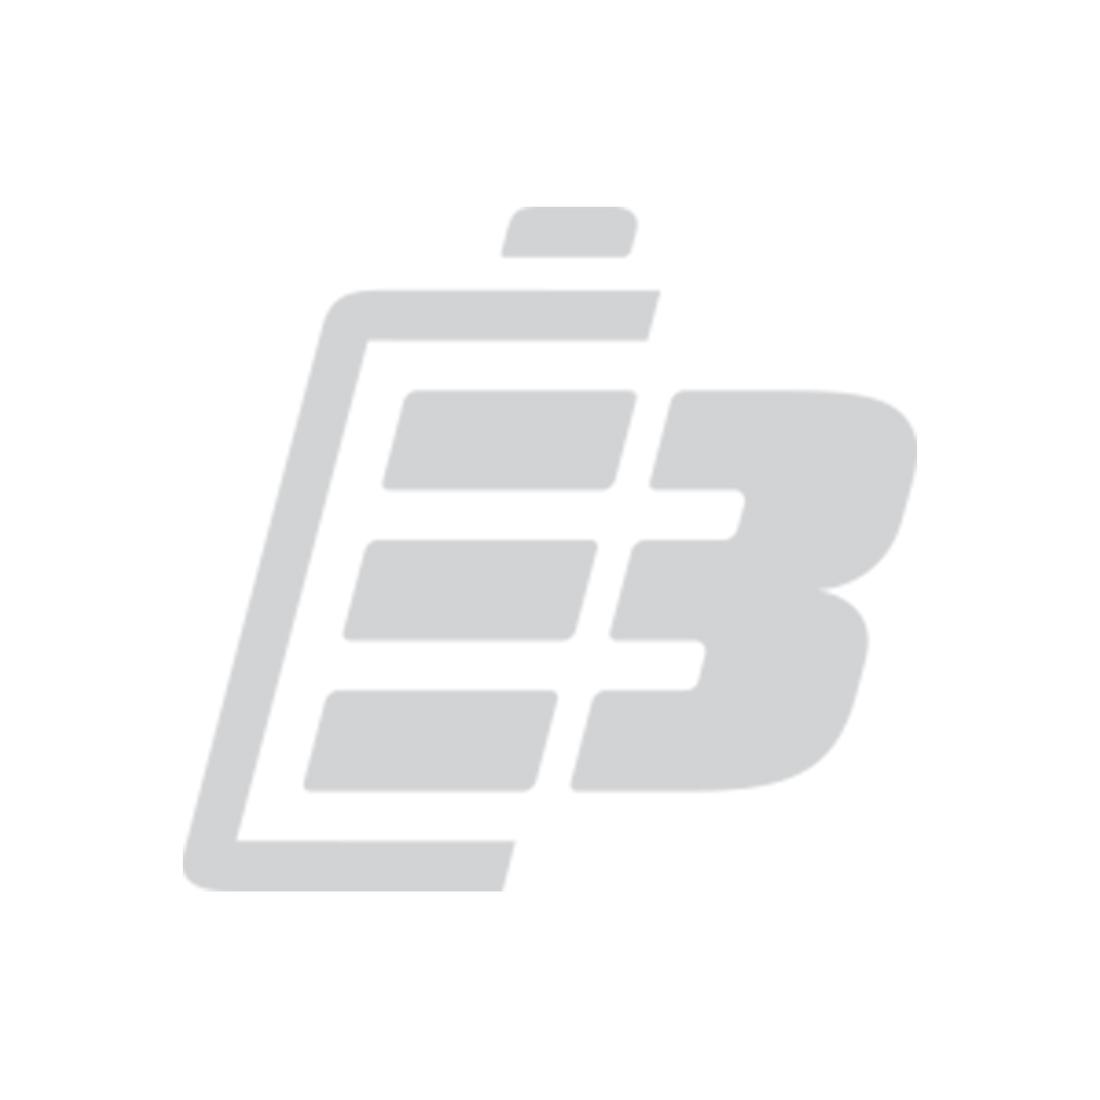 Choetech Q34U2Q USB-C PD QC3 Fast Charger 5 x USB